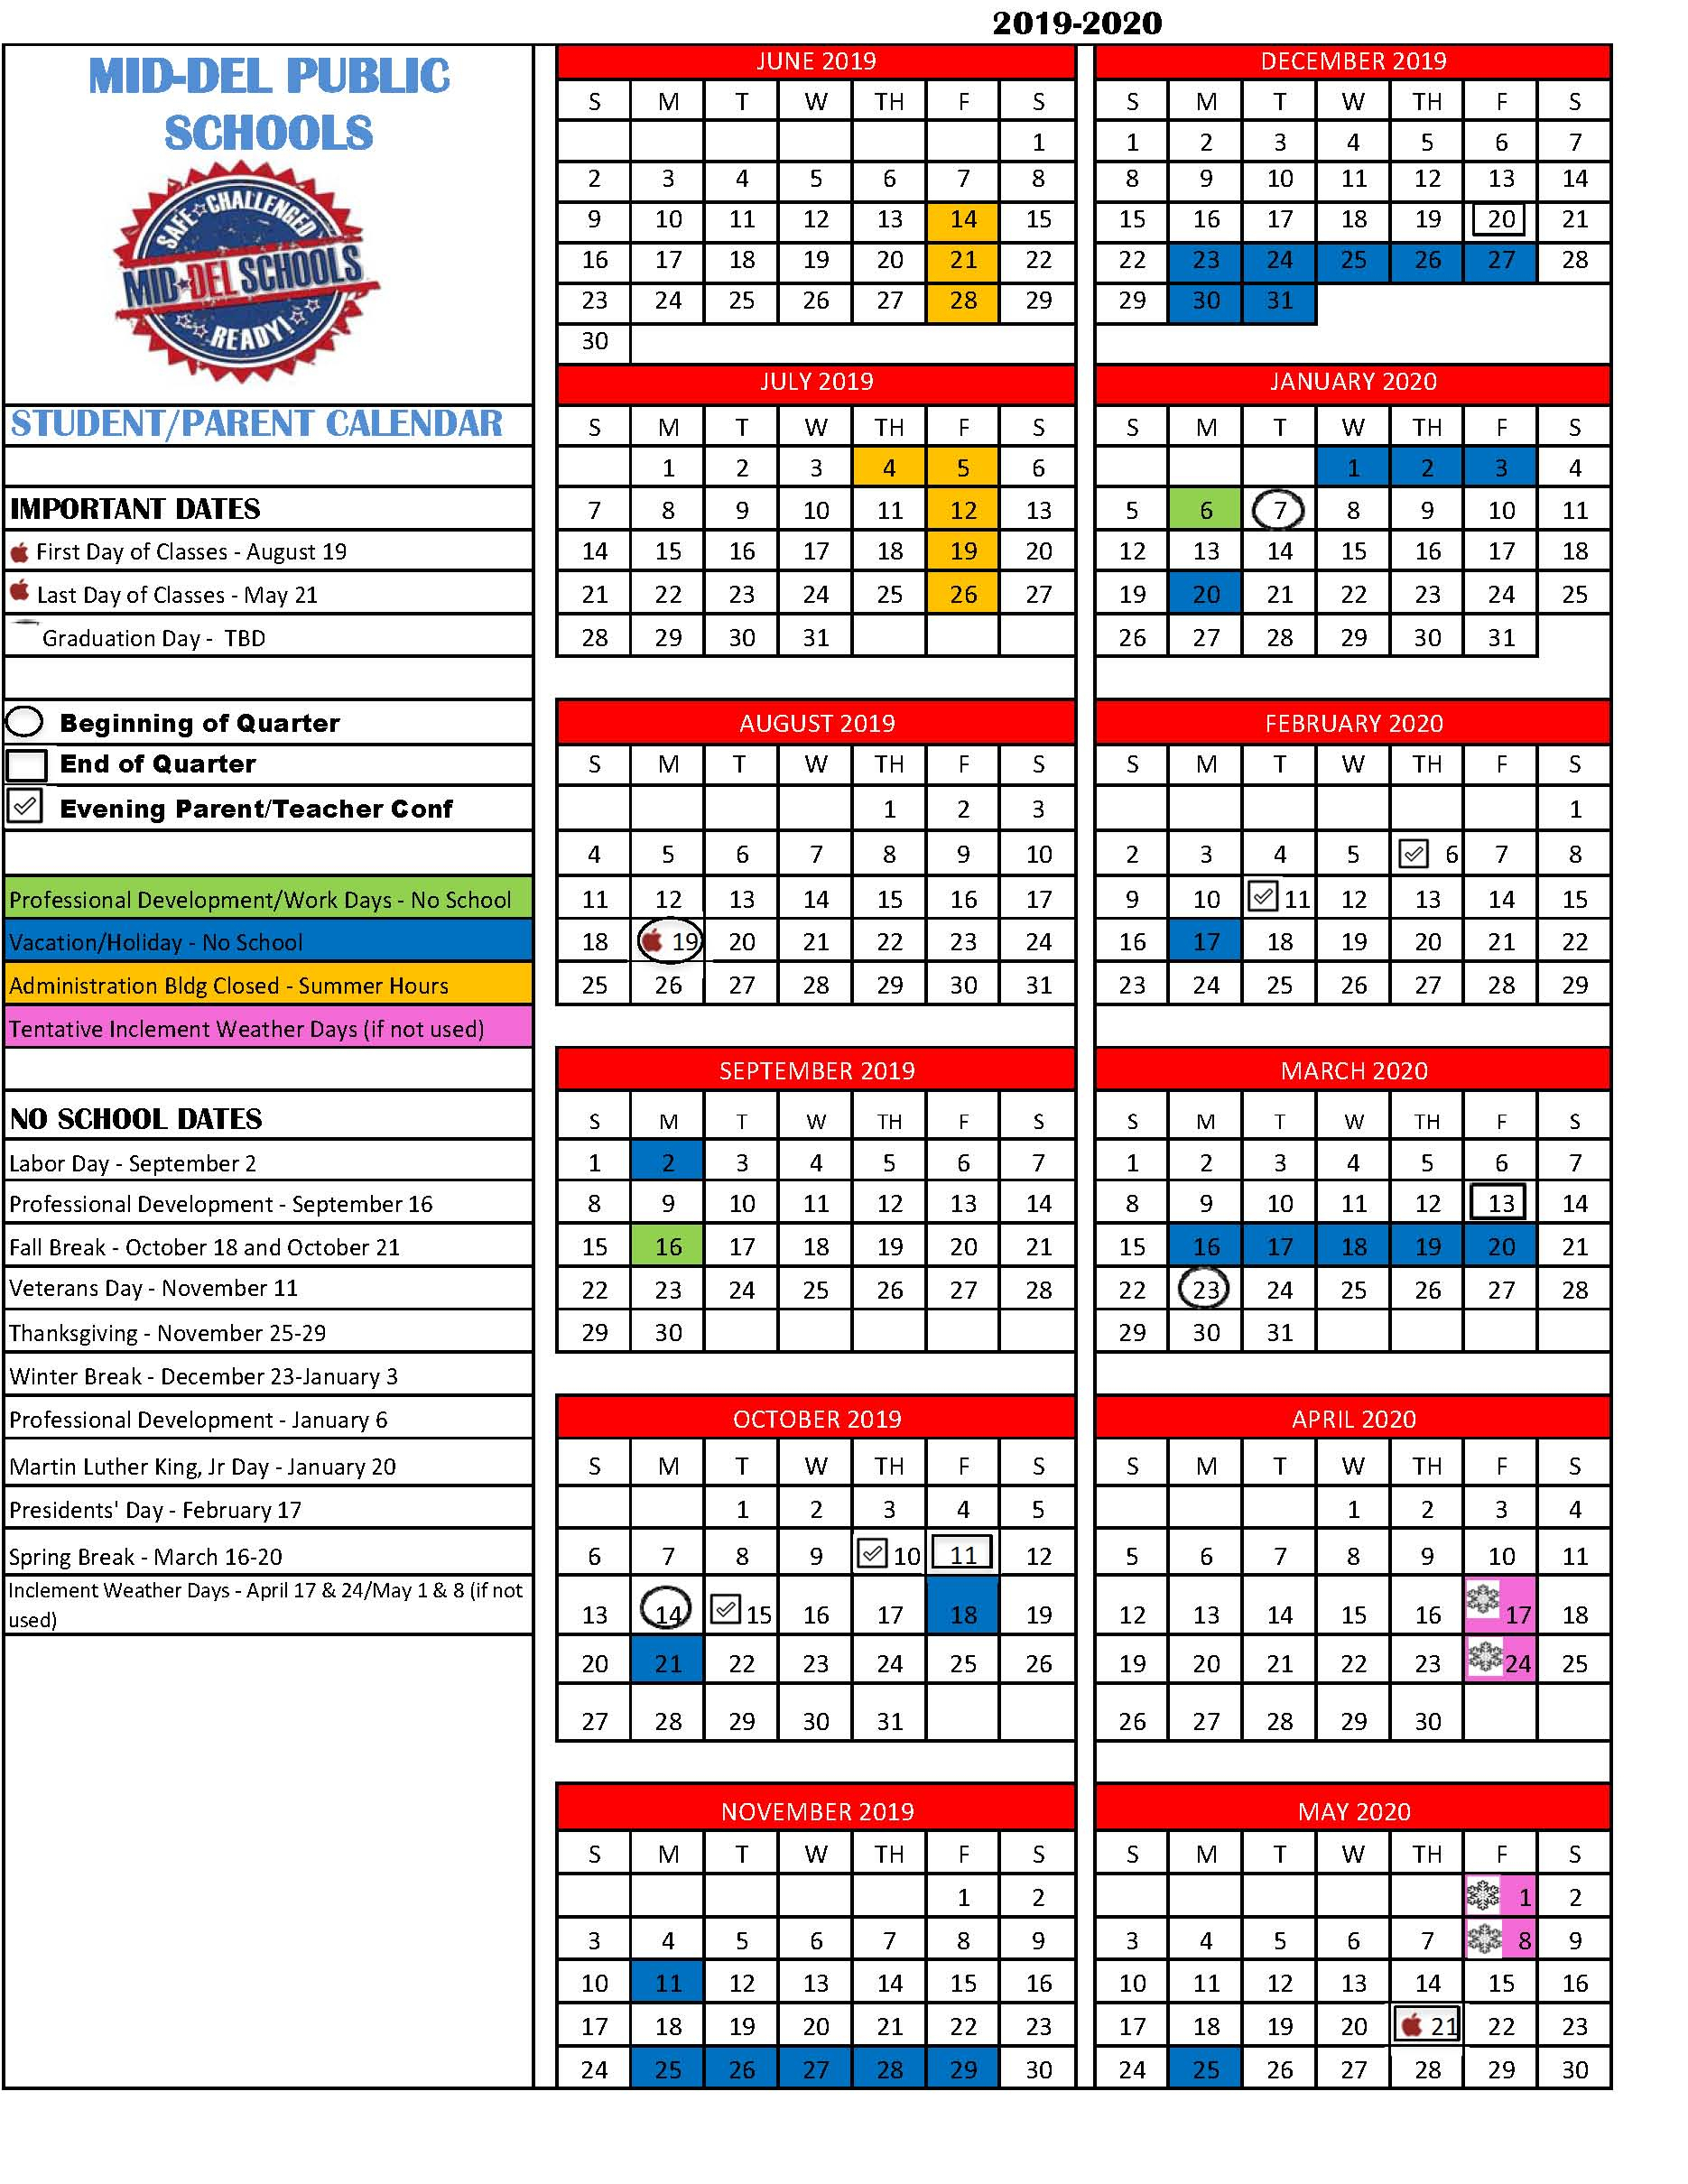 Middel Technology Center with Nicoma Park Middle School Calendar